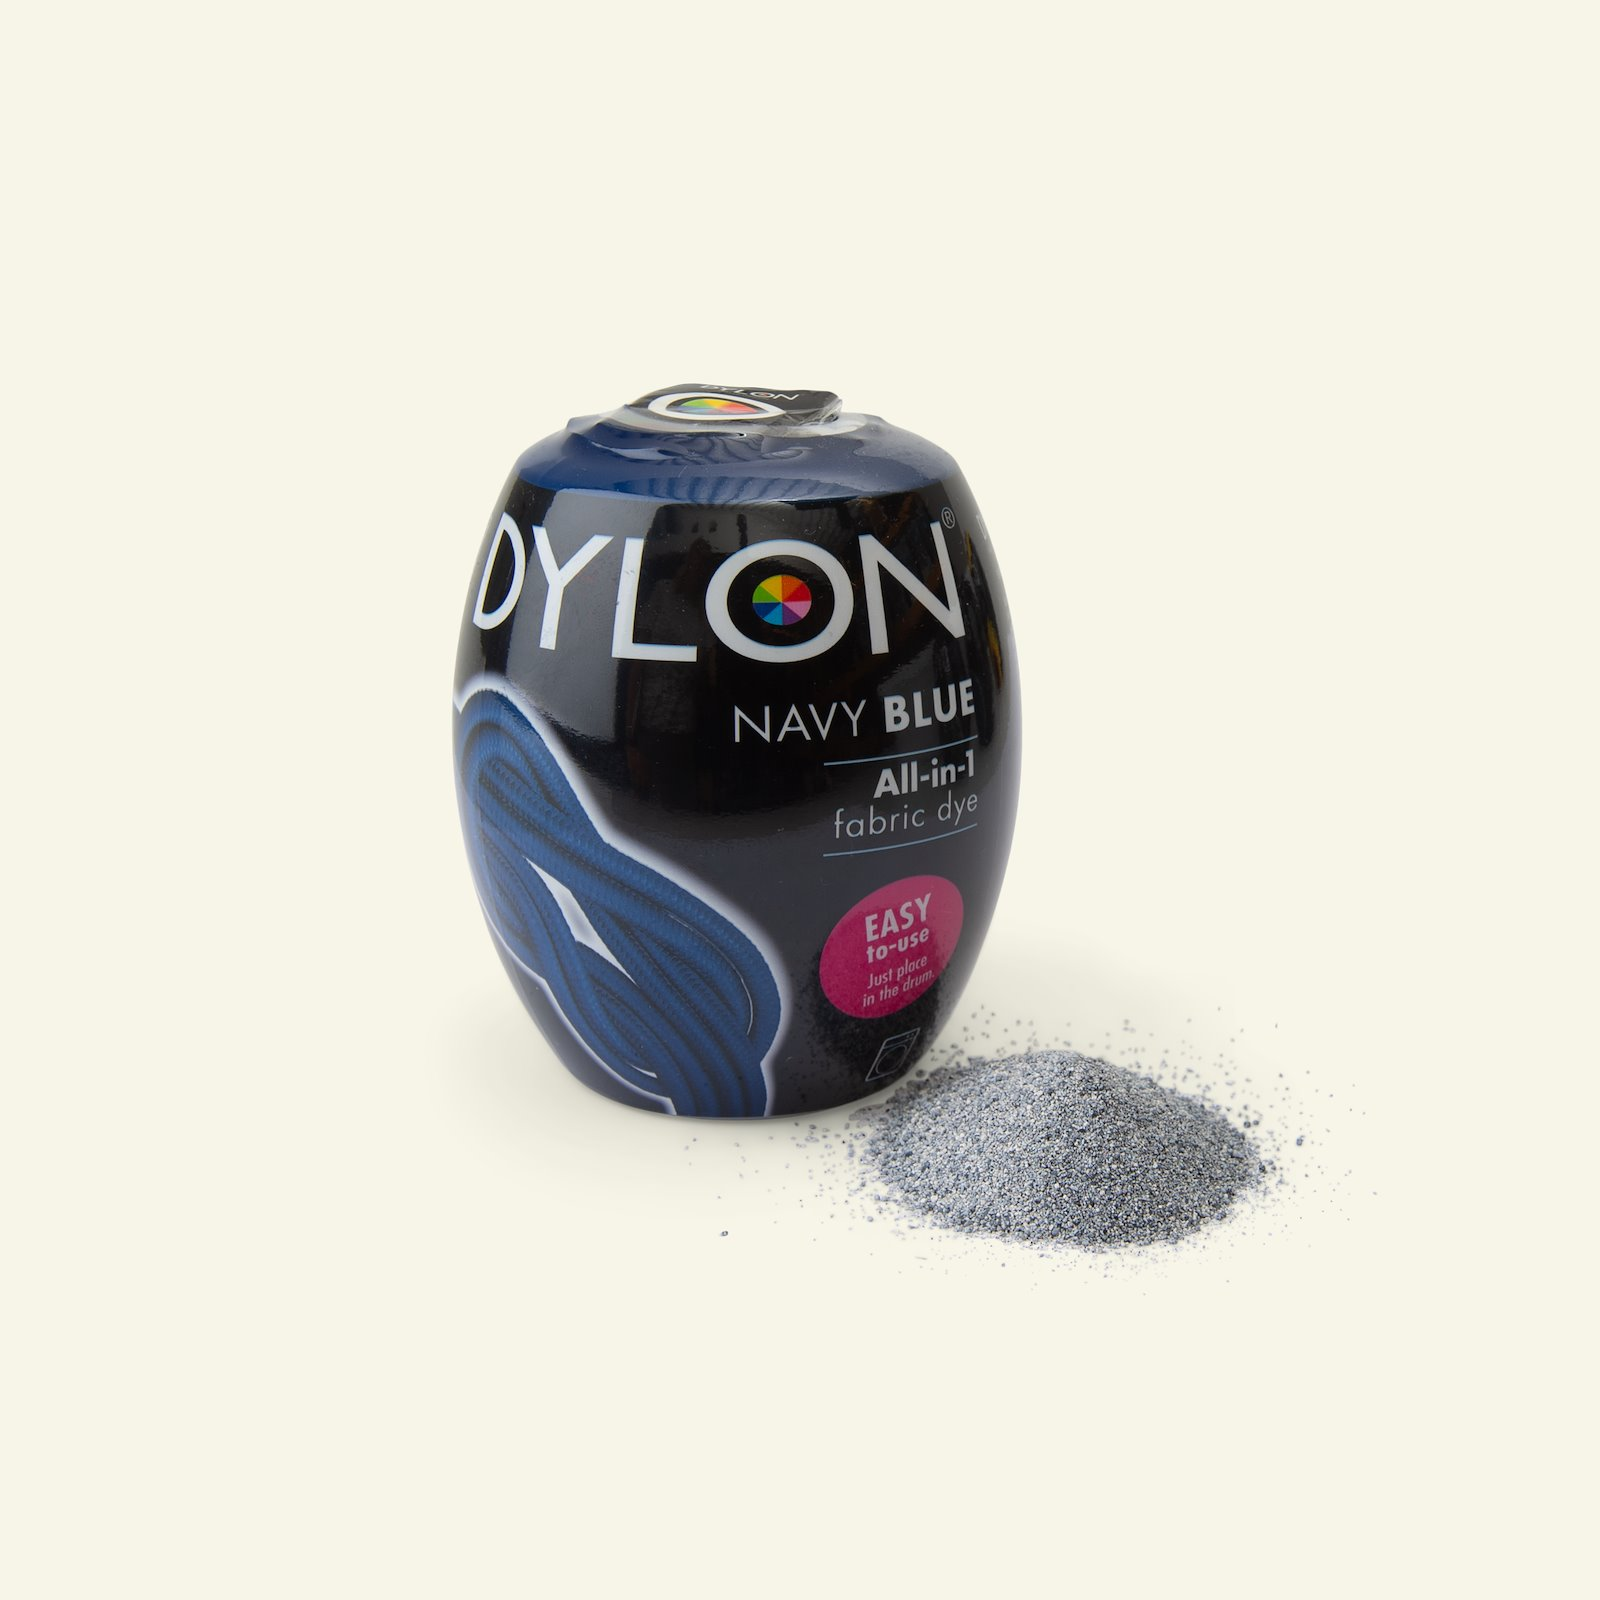 Dylon fabric dye for machine navy 29703_pack